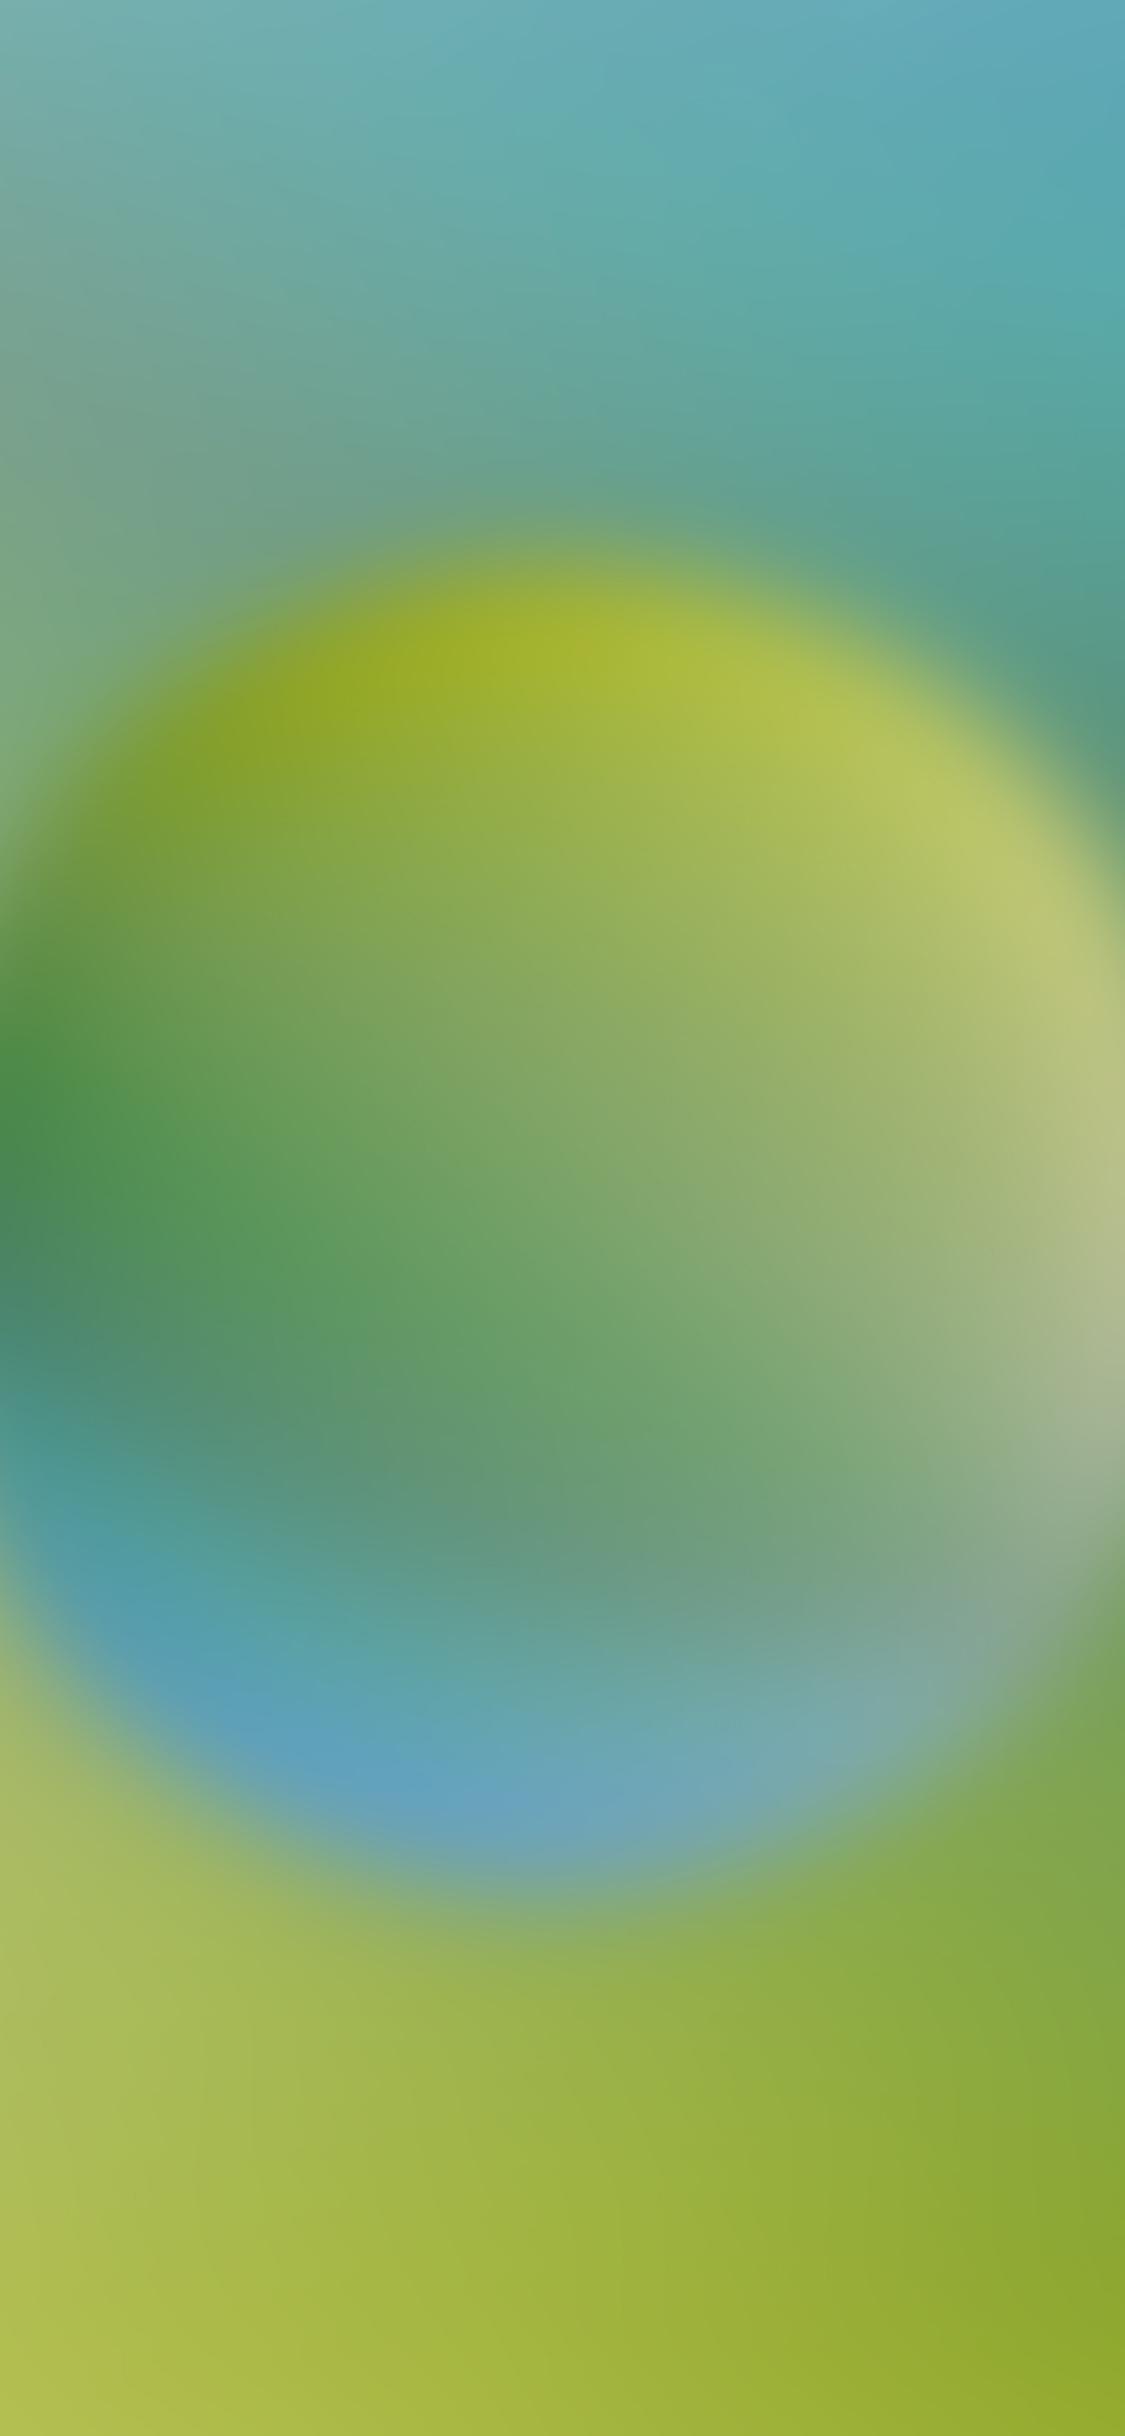 iPhoneXpapers.com-Apple-iPhone-wallpaper-sk67-green-circle-blur-gradation